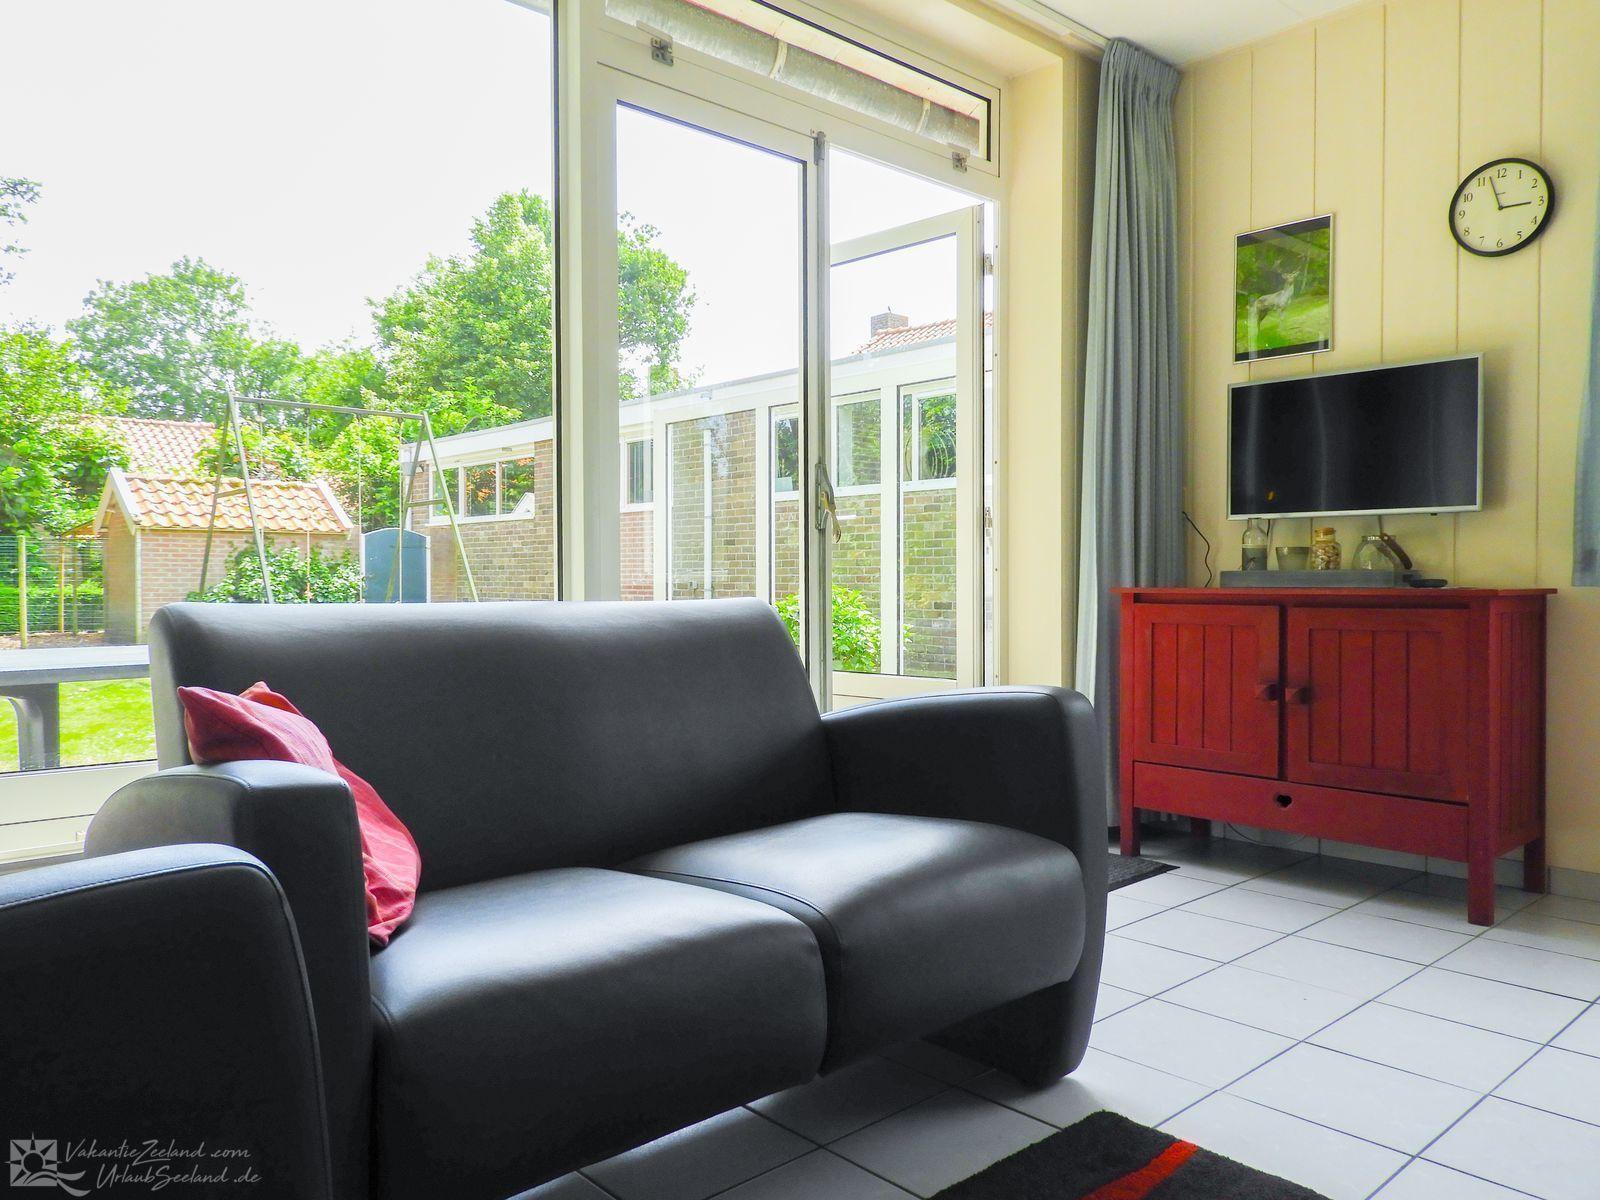 VZ641 Ferienwohnung Koudekerke-Dishoek